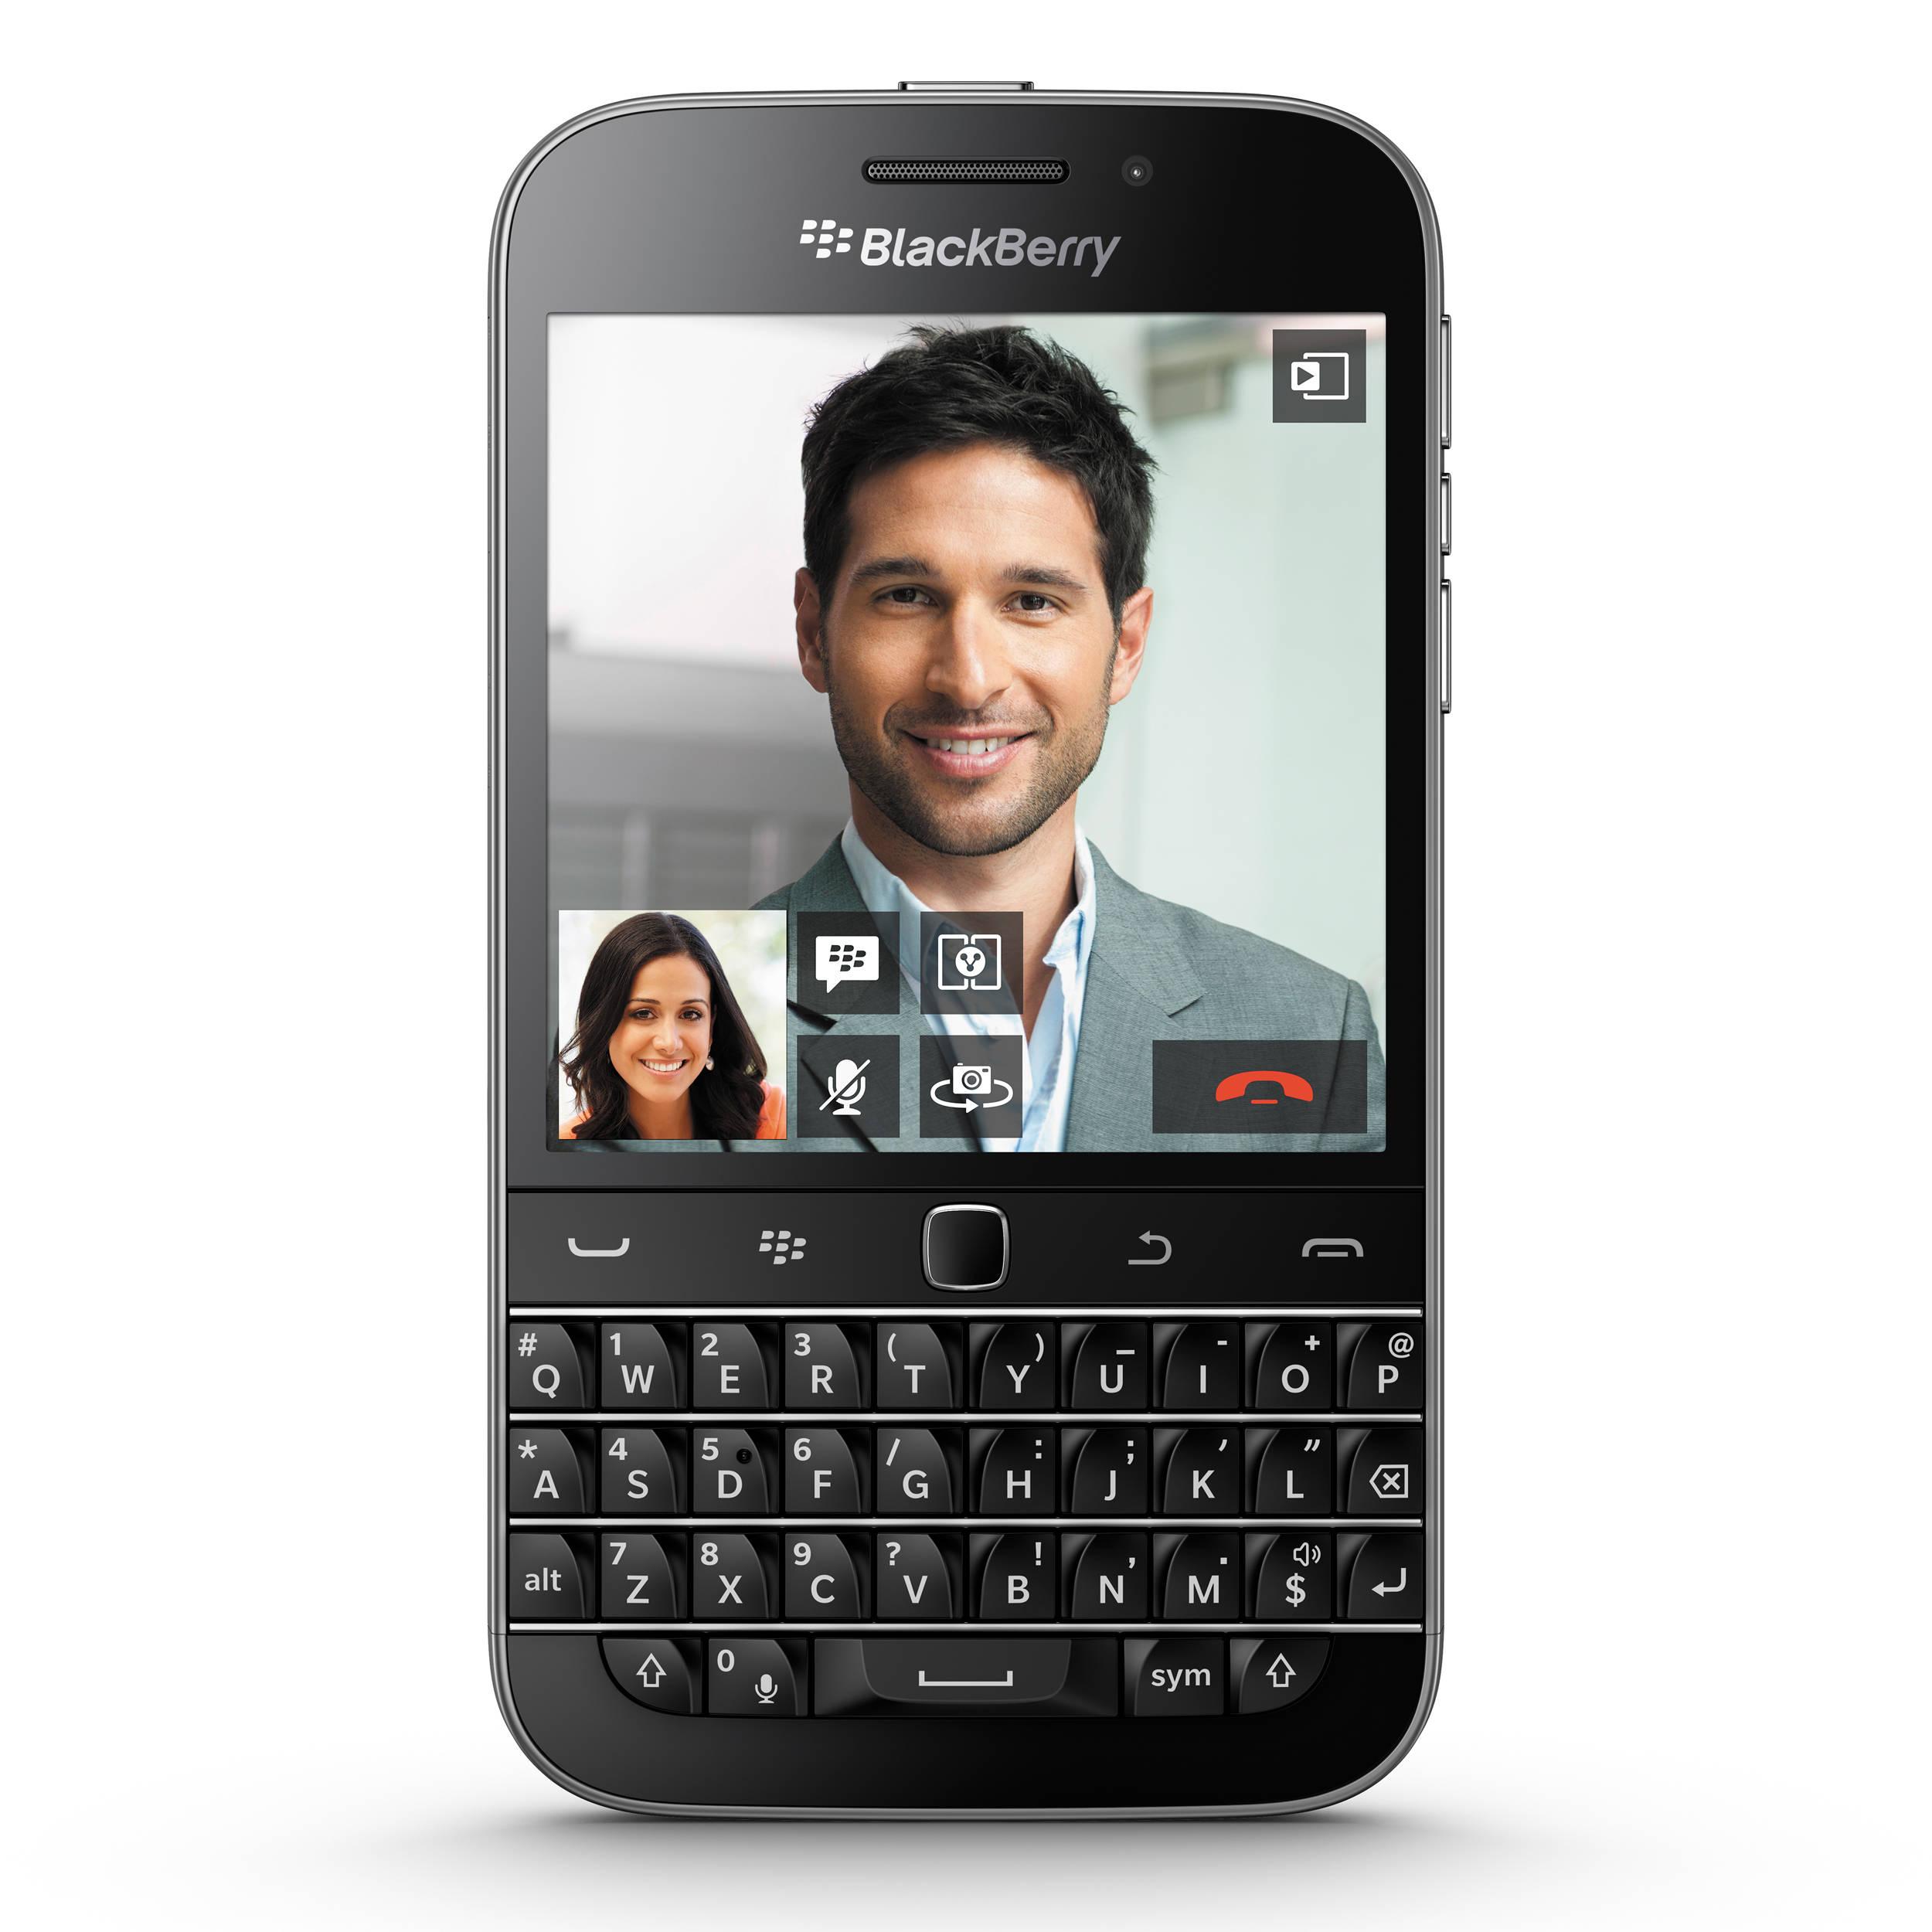 Free cell phone porn for blackberry porno photo